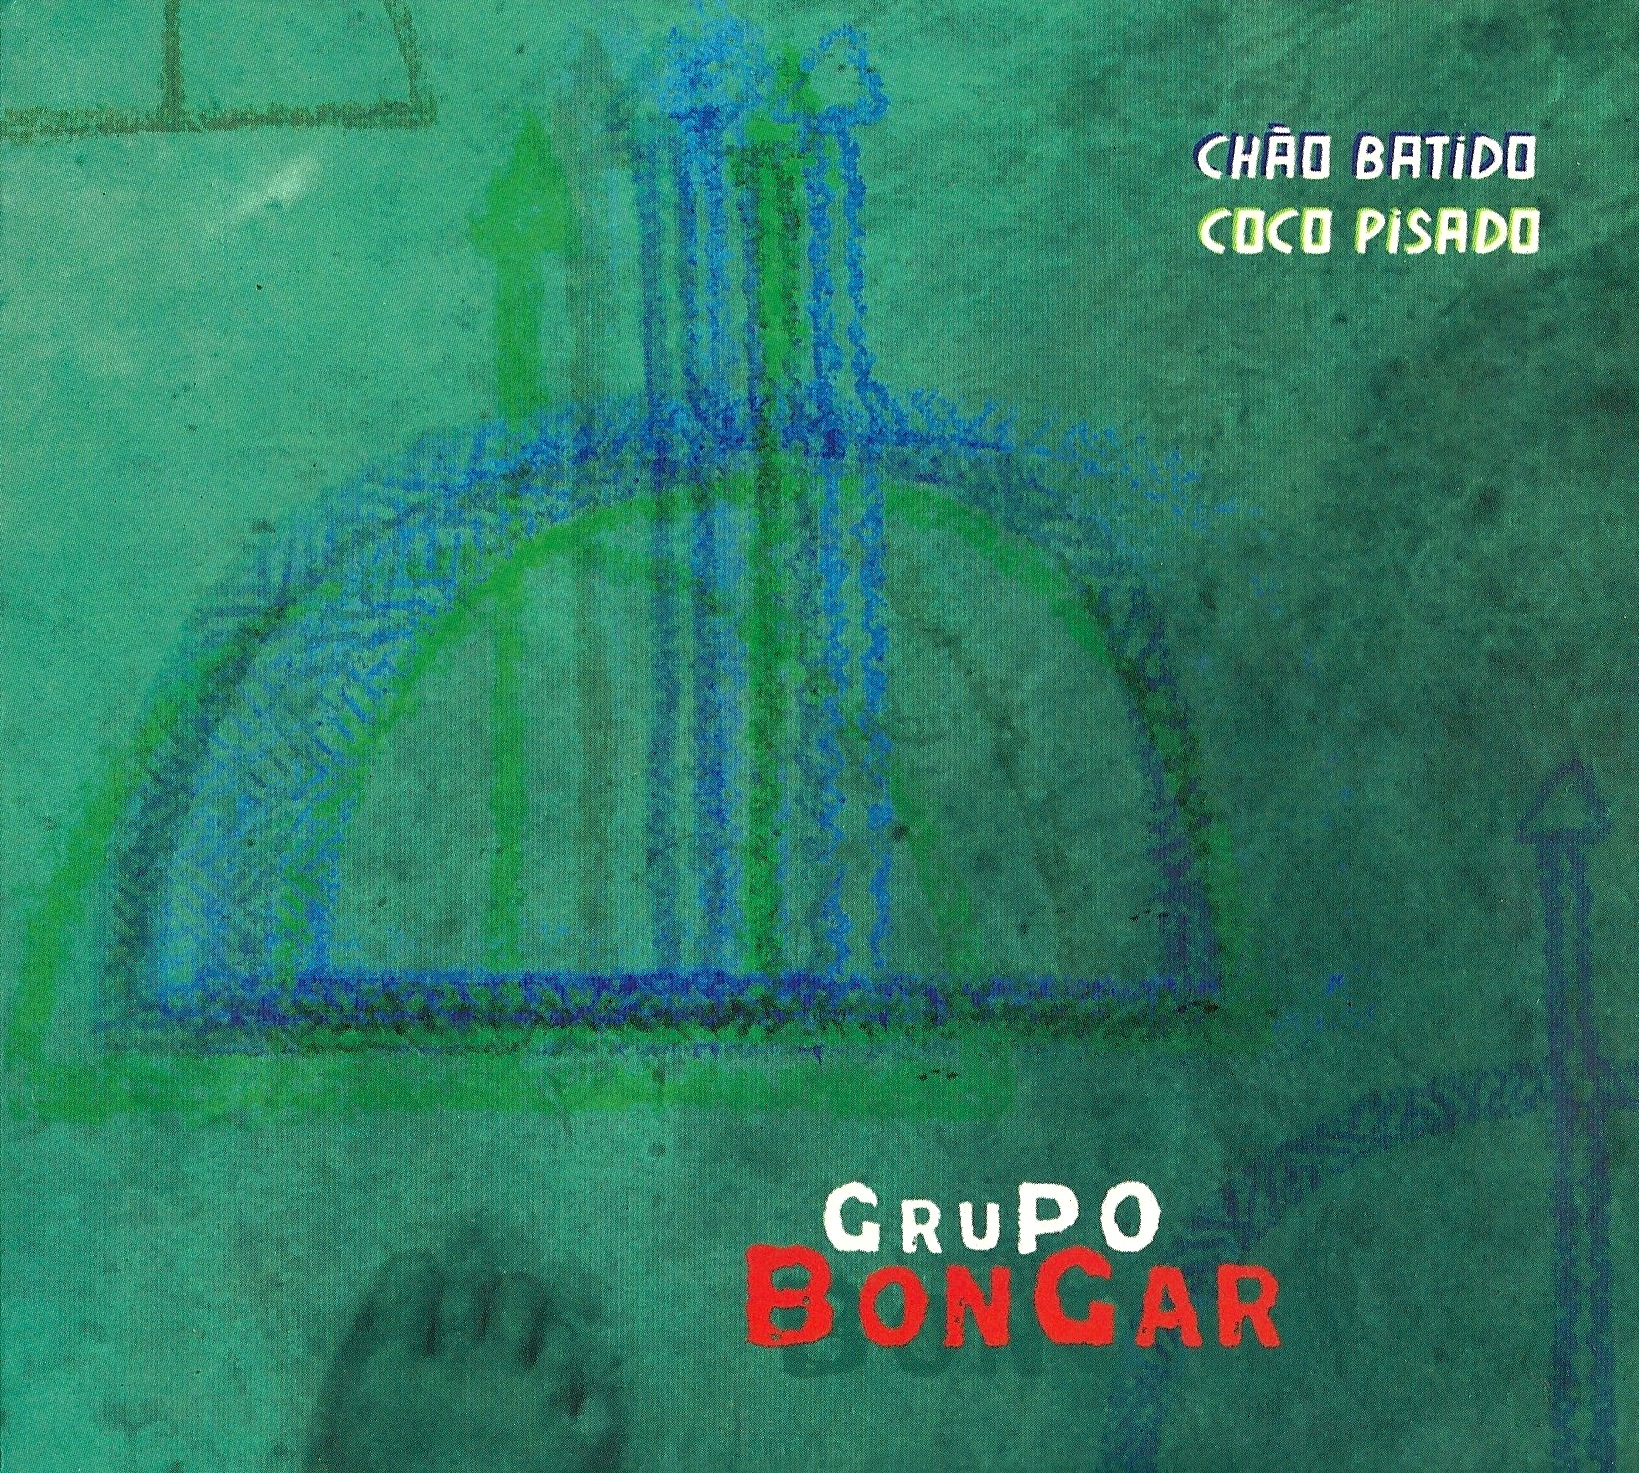 19 2010 Chao Batido, Coco Pisado - Bongar.jpg